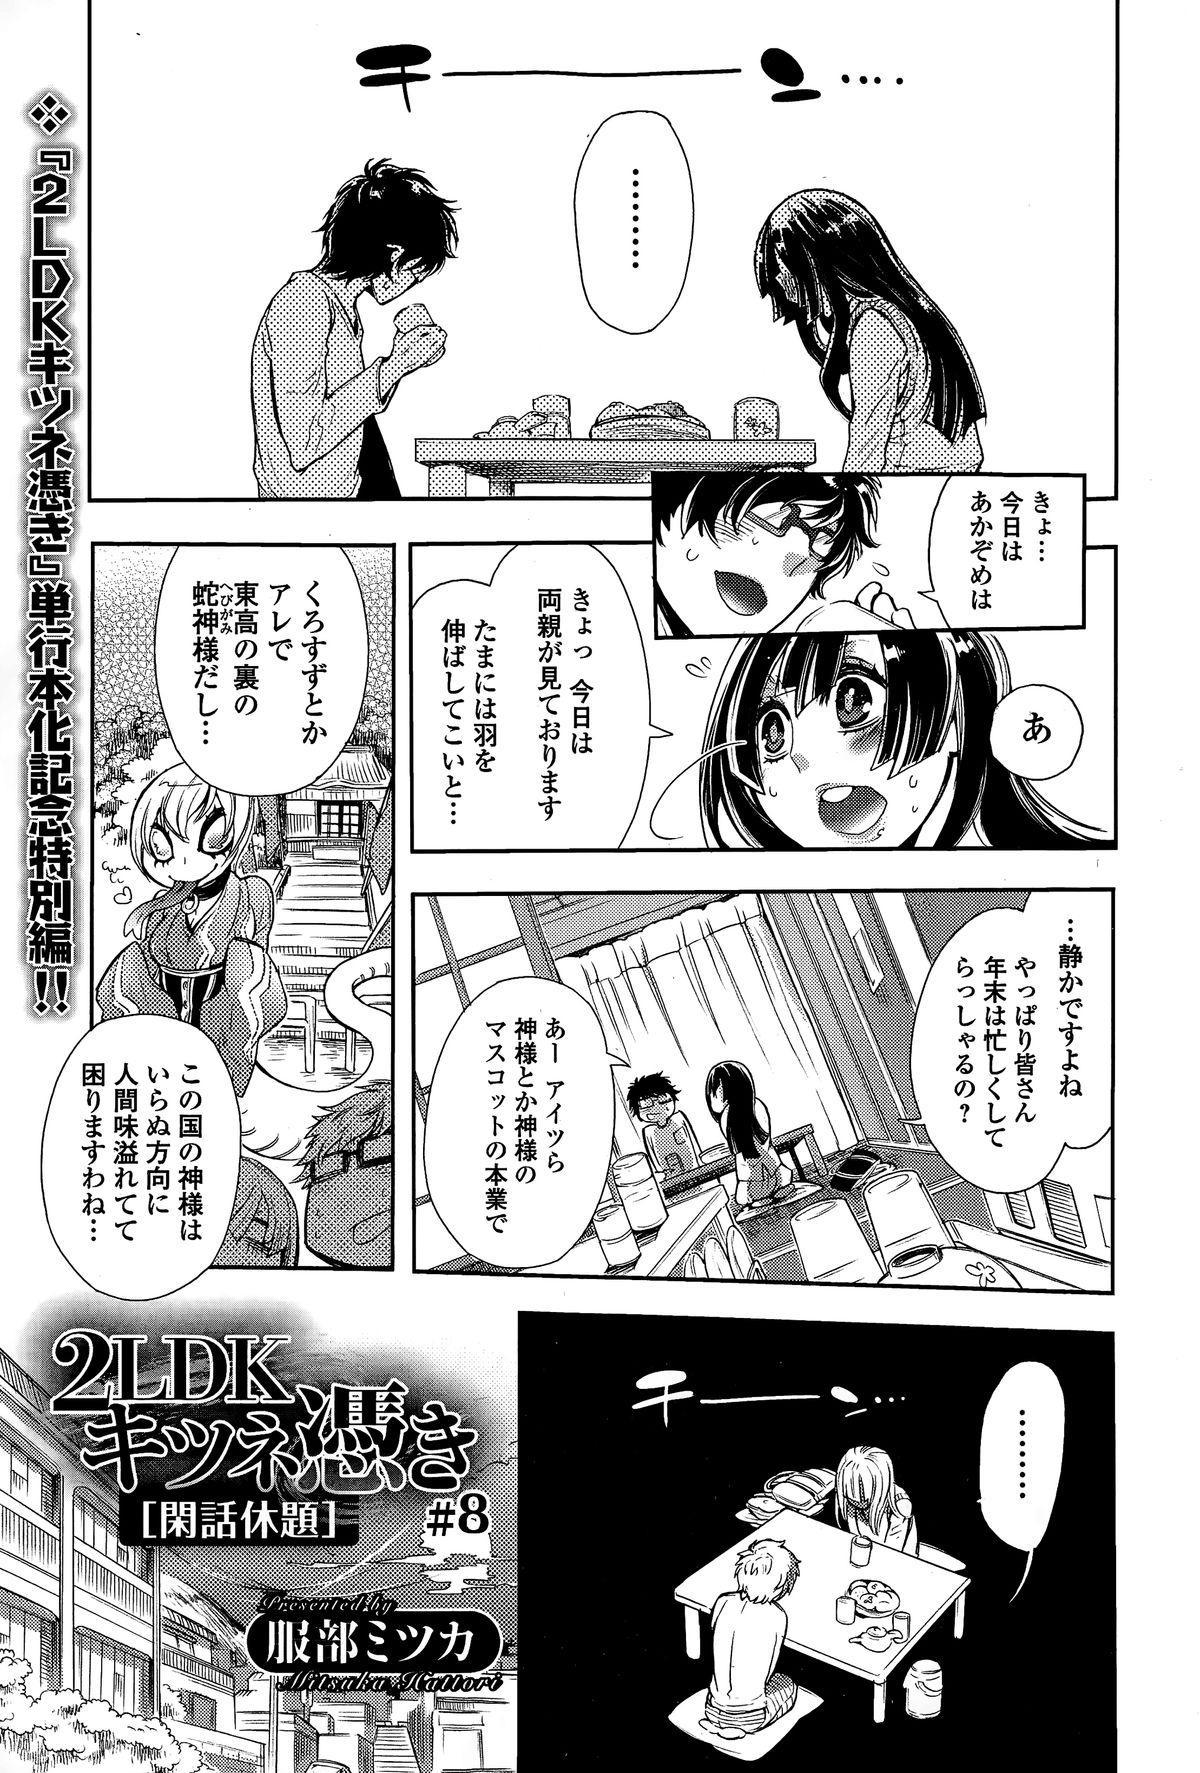 Comic Toutetsu 2015-02 Vol. 3 220